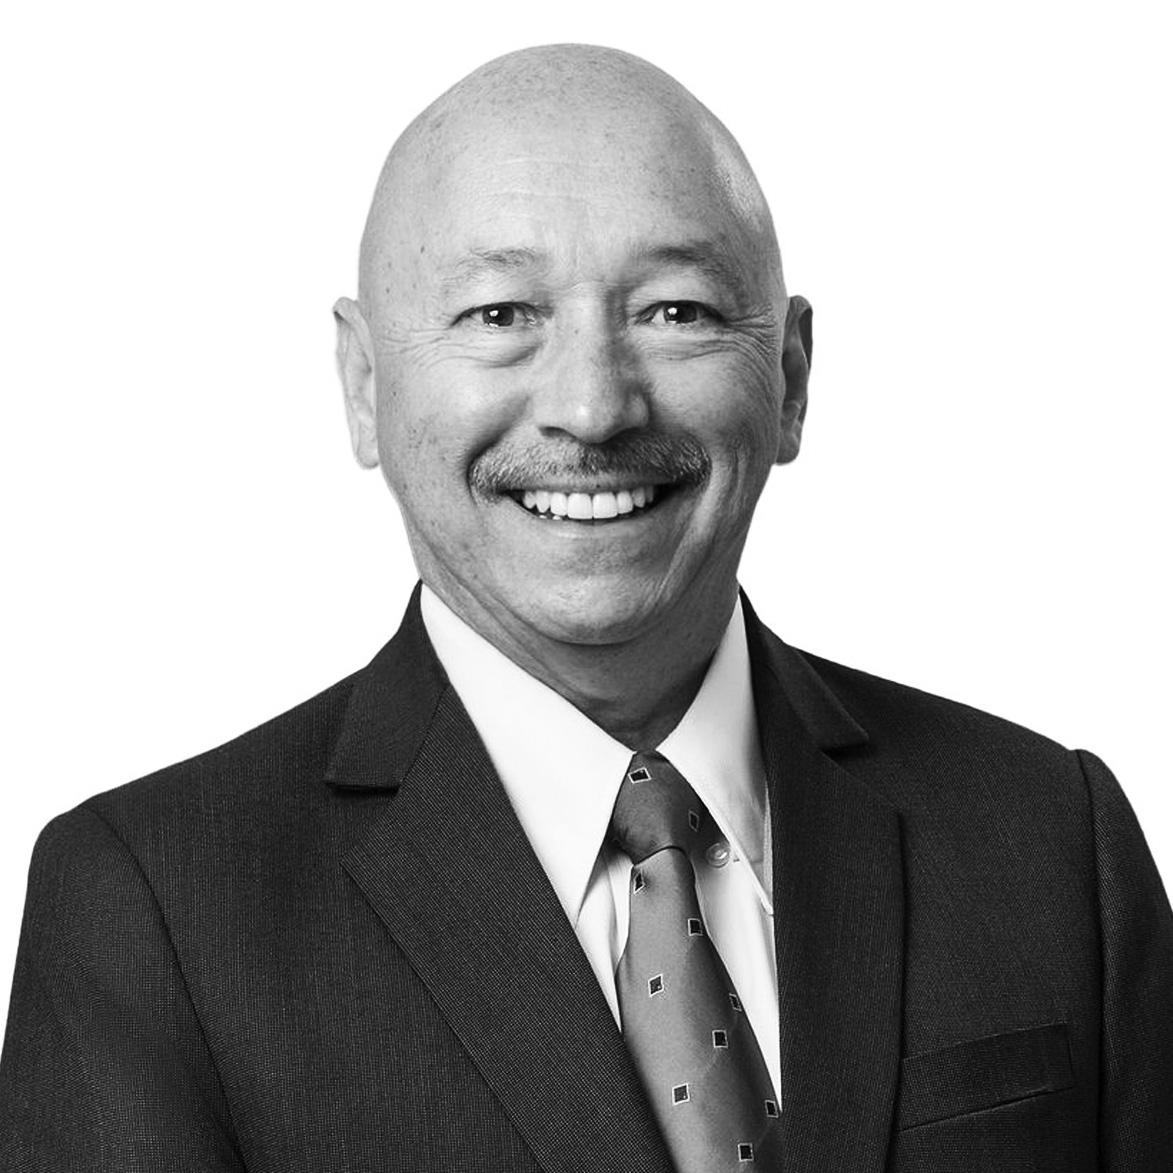 Tony Papineau